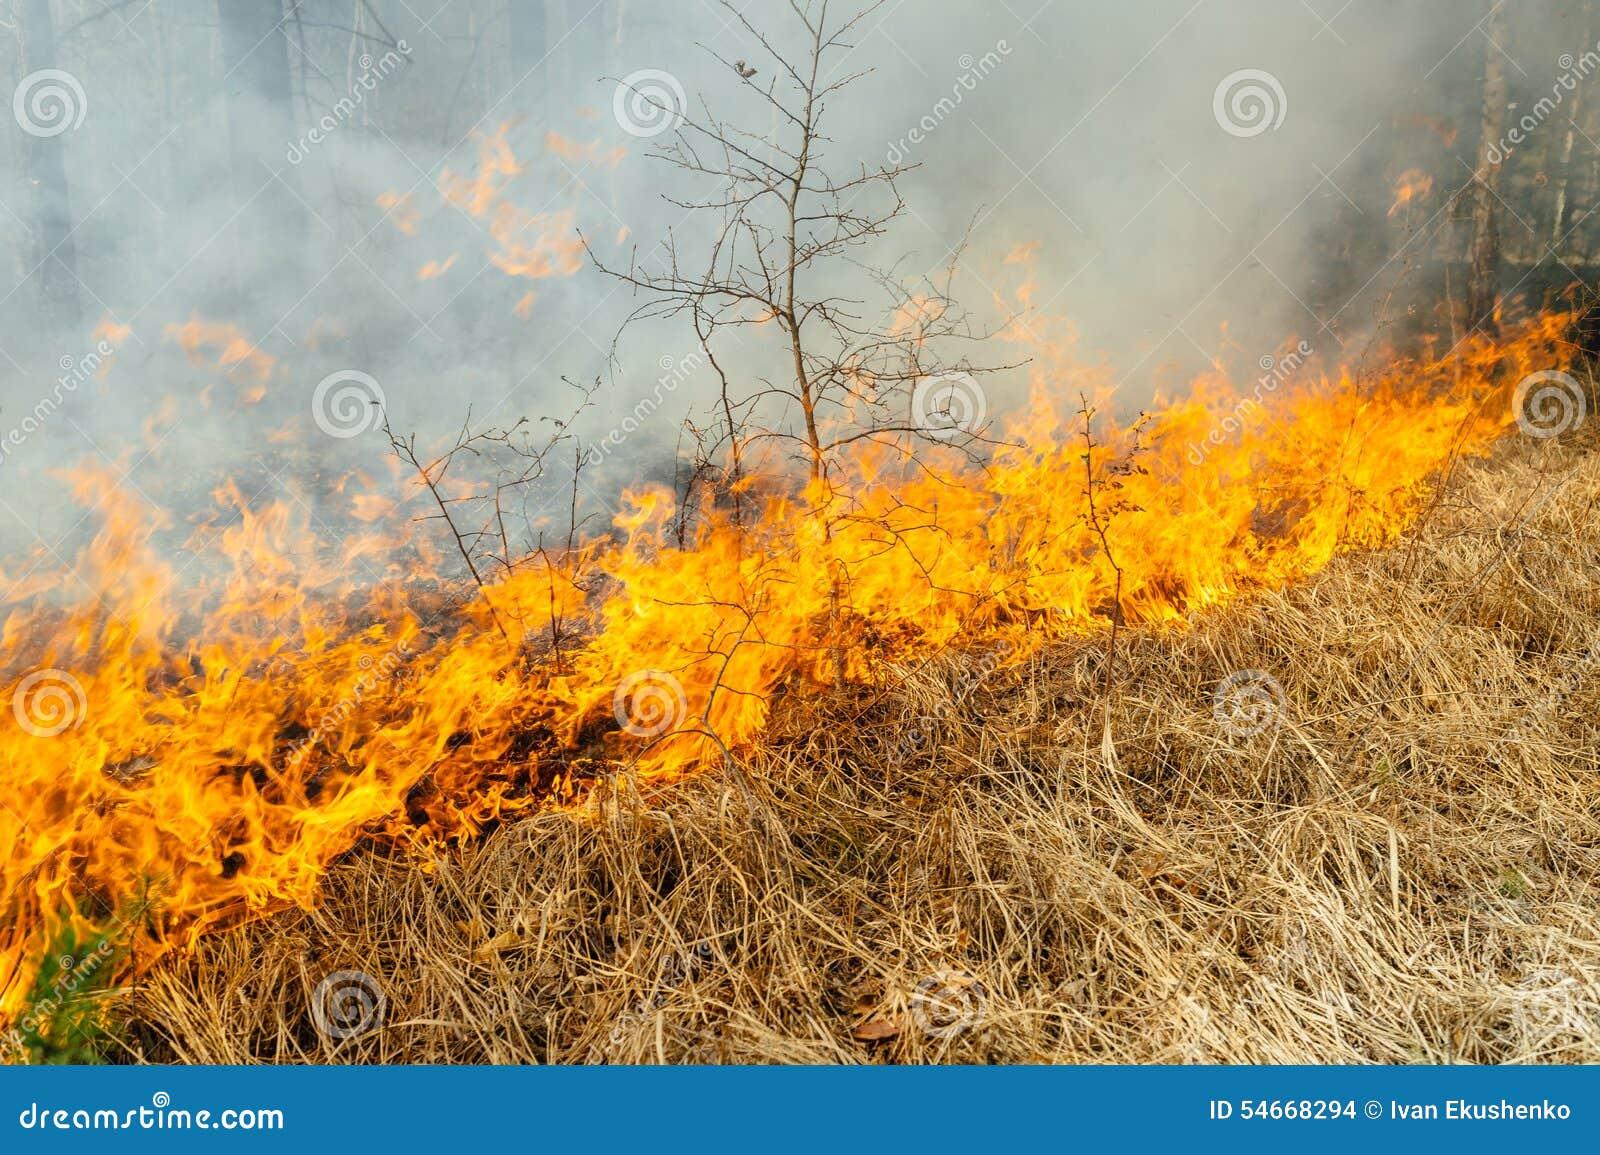 Wildfire Stock Photo Image 54668294